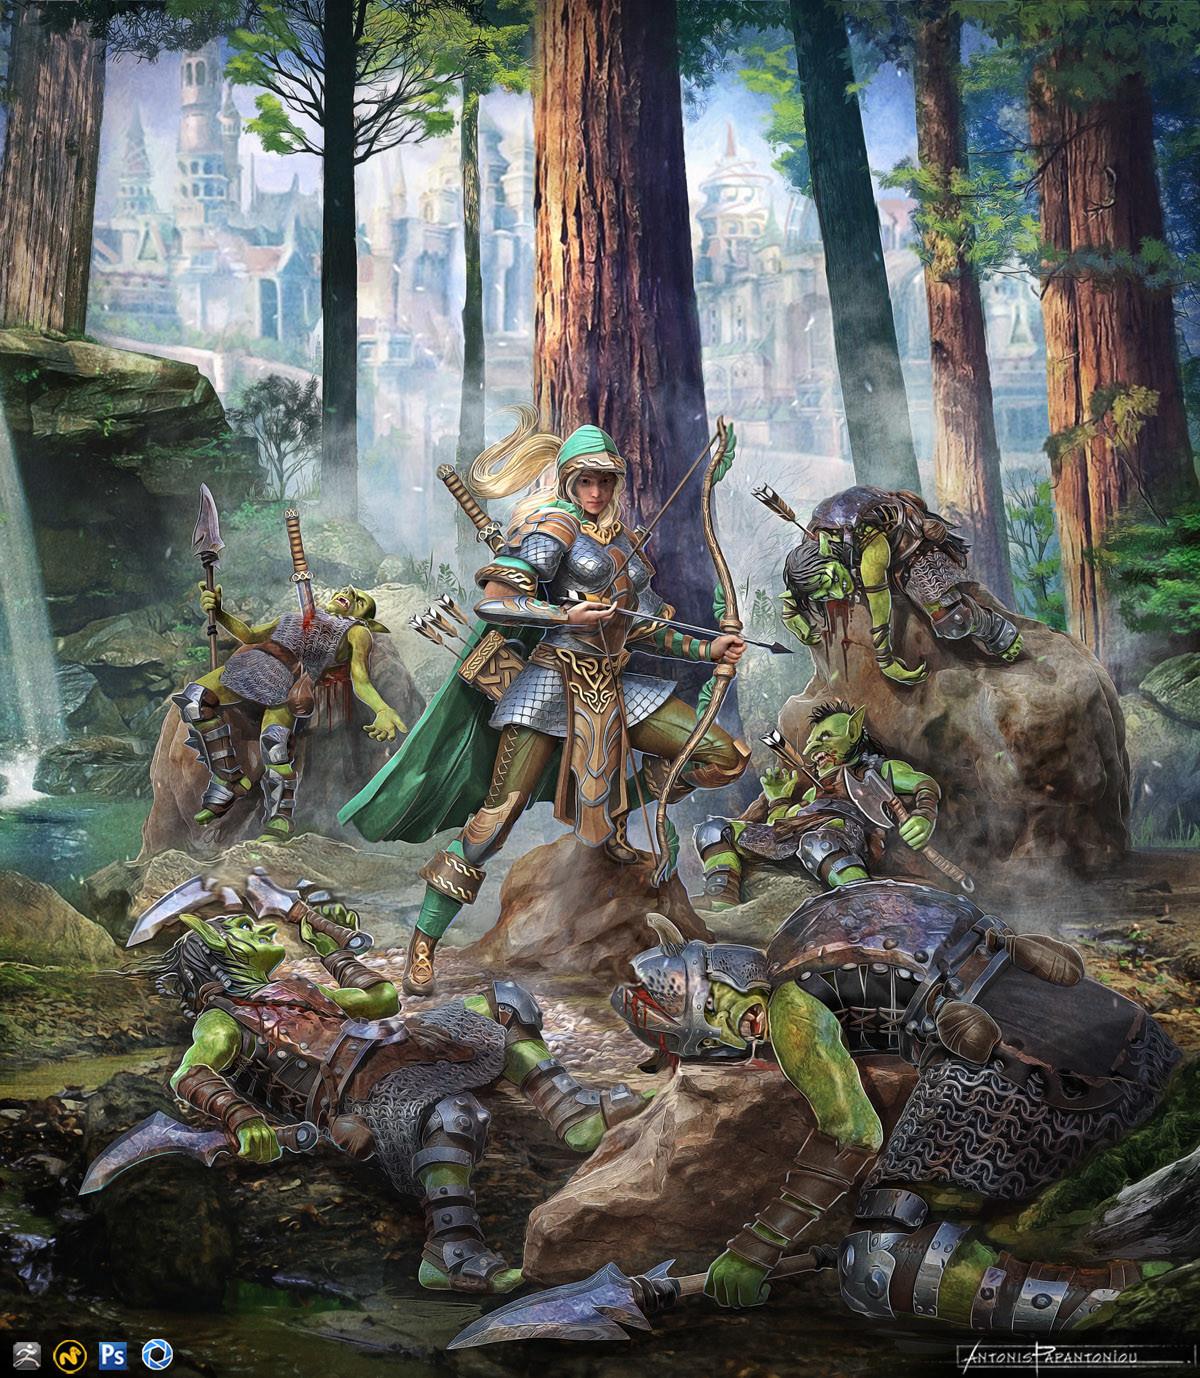 Antonis papantoniou forestsentinel